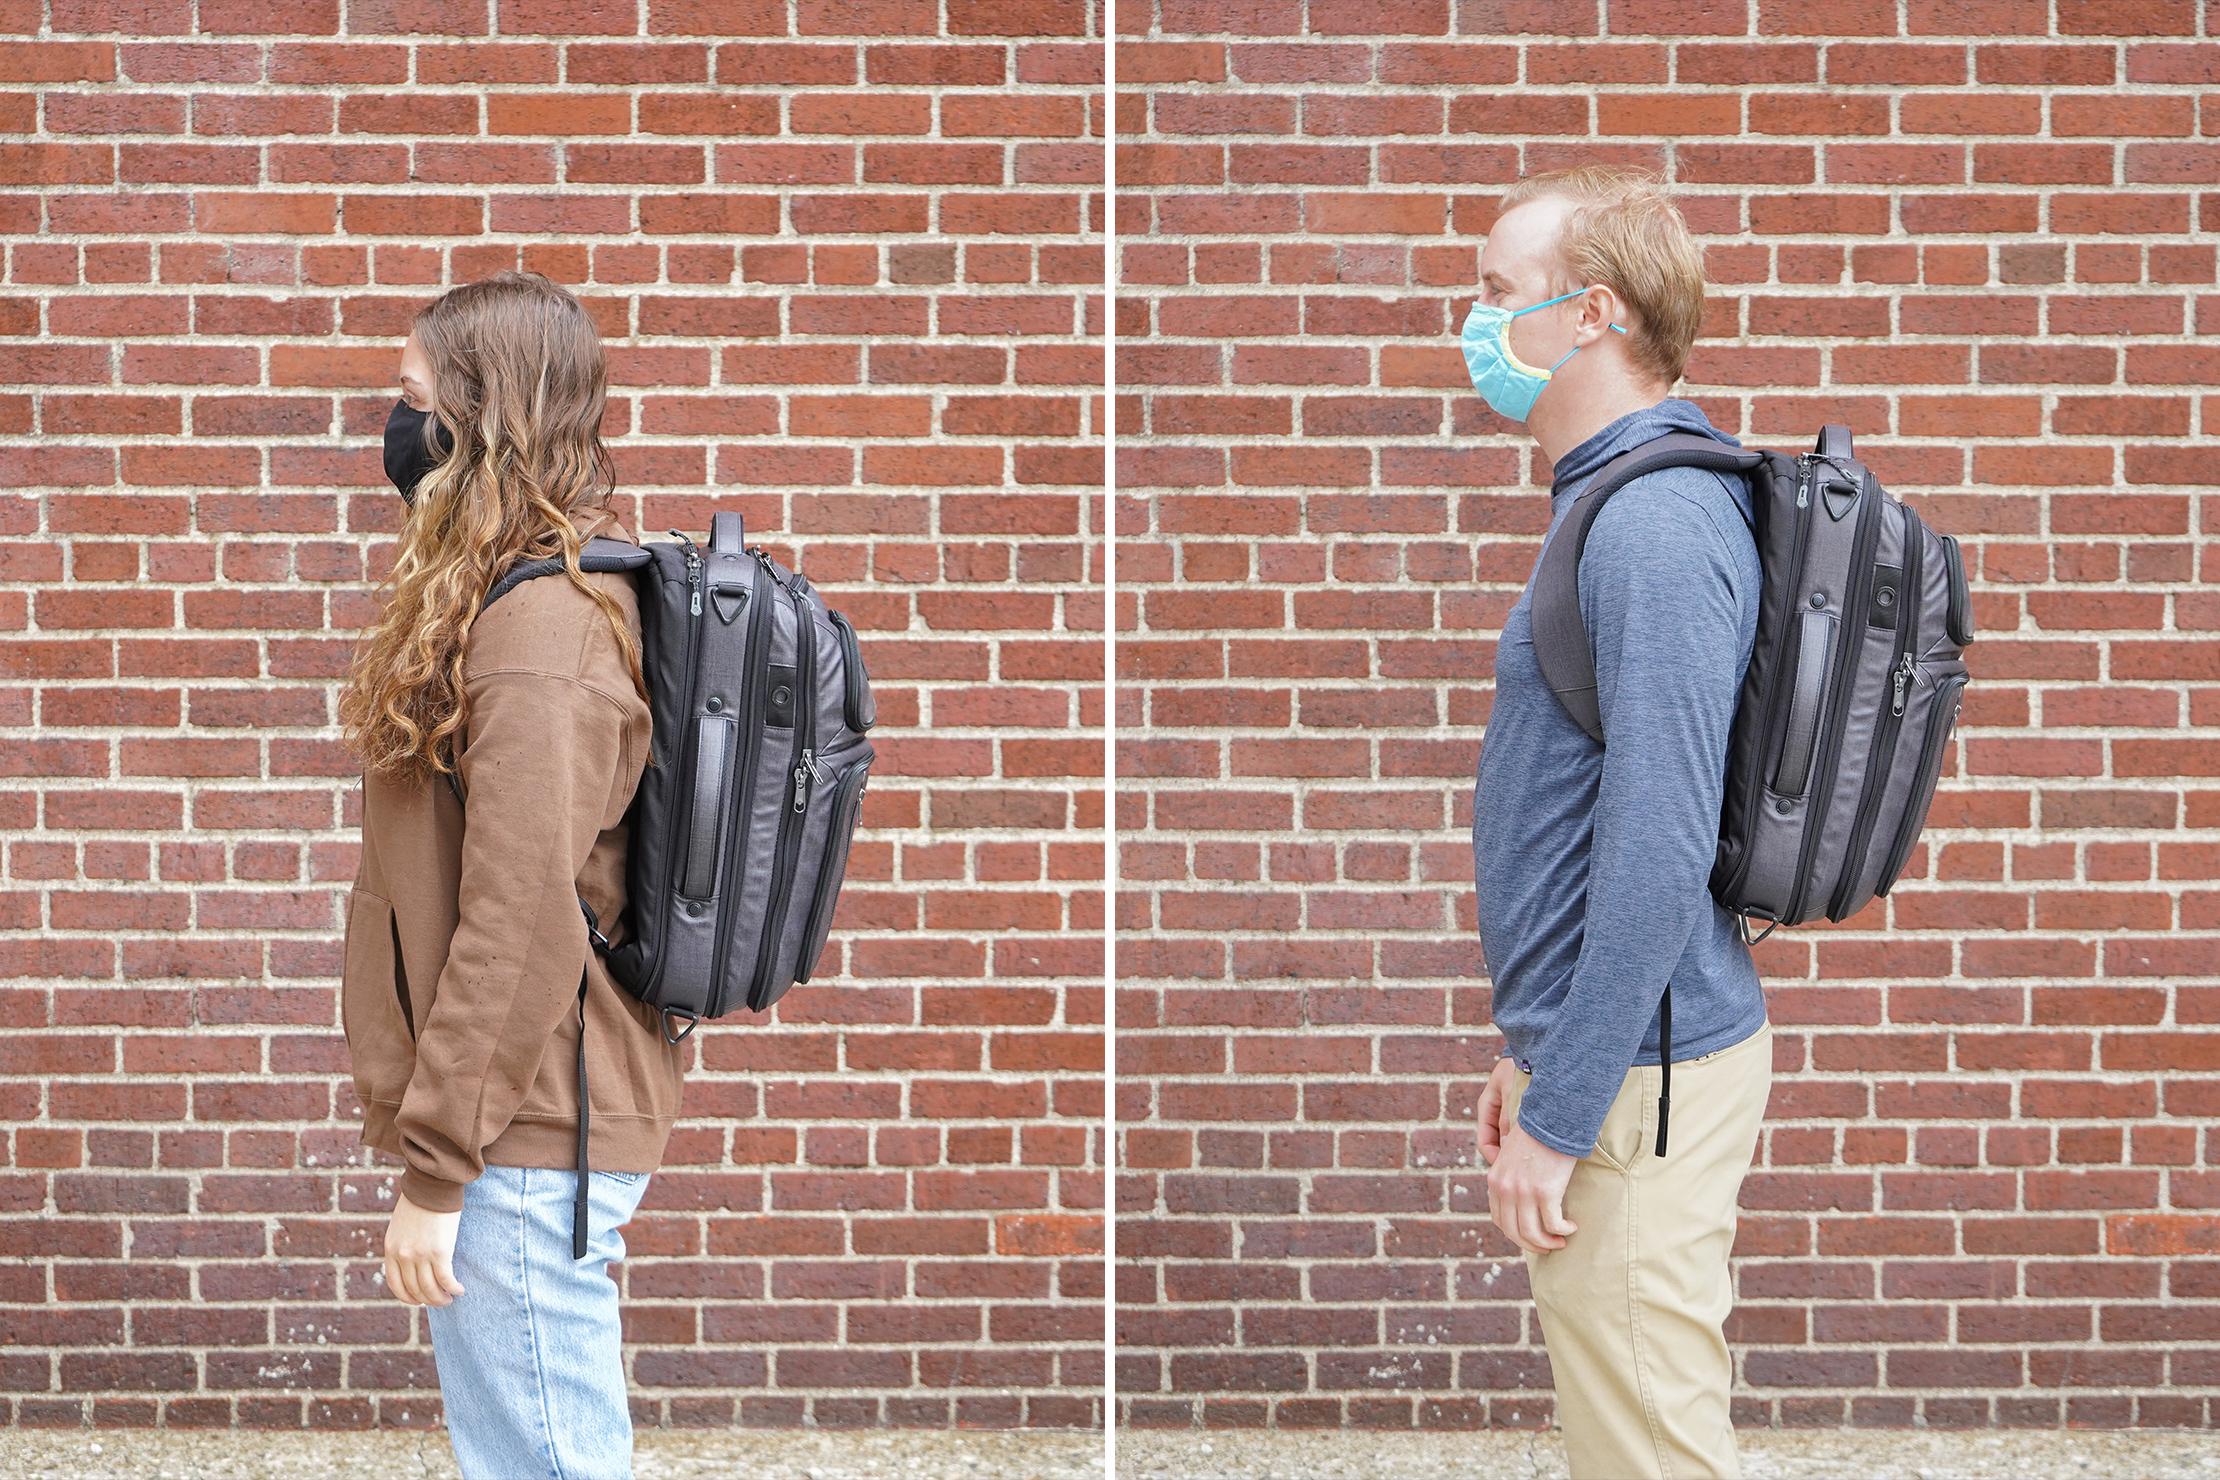 "Left: Riley, Height, 5'4"" (162 cm), Torso: 16.5"" (42 cm) | Right: Mark, Height, 5'10"" (178 cm), Torso: 19"" (48 cm)"